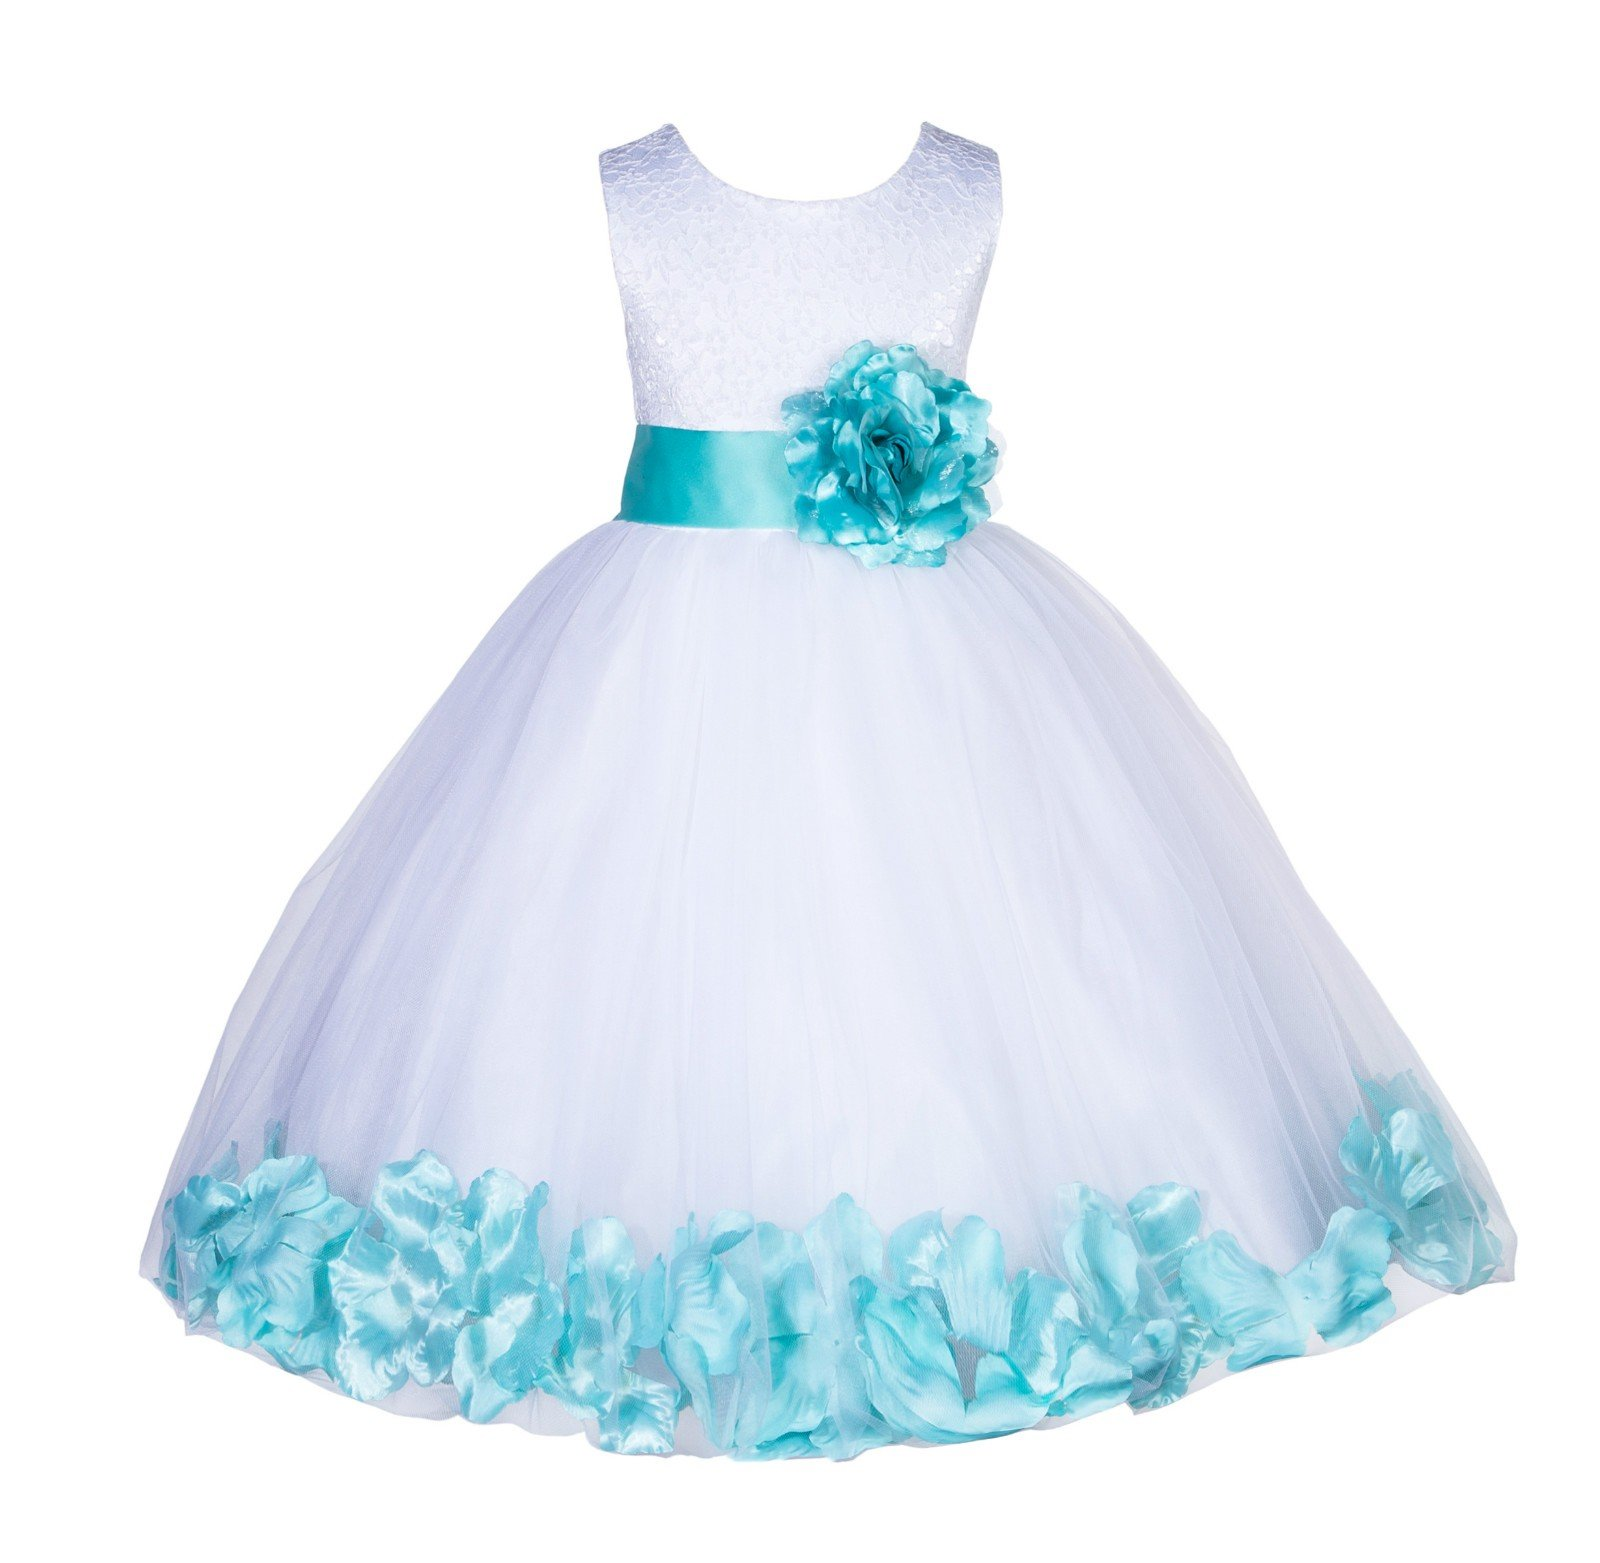 ekidsbridal White Lace Top Tulle Floral Petals Flower Girl Dress Christening Dresses 165S 4